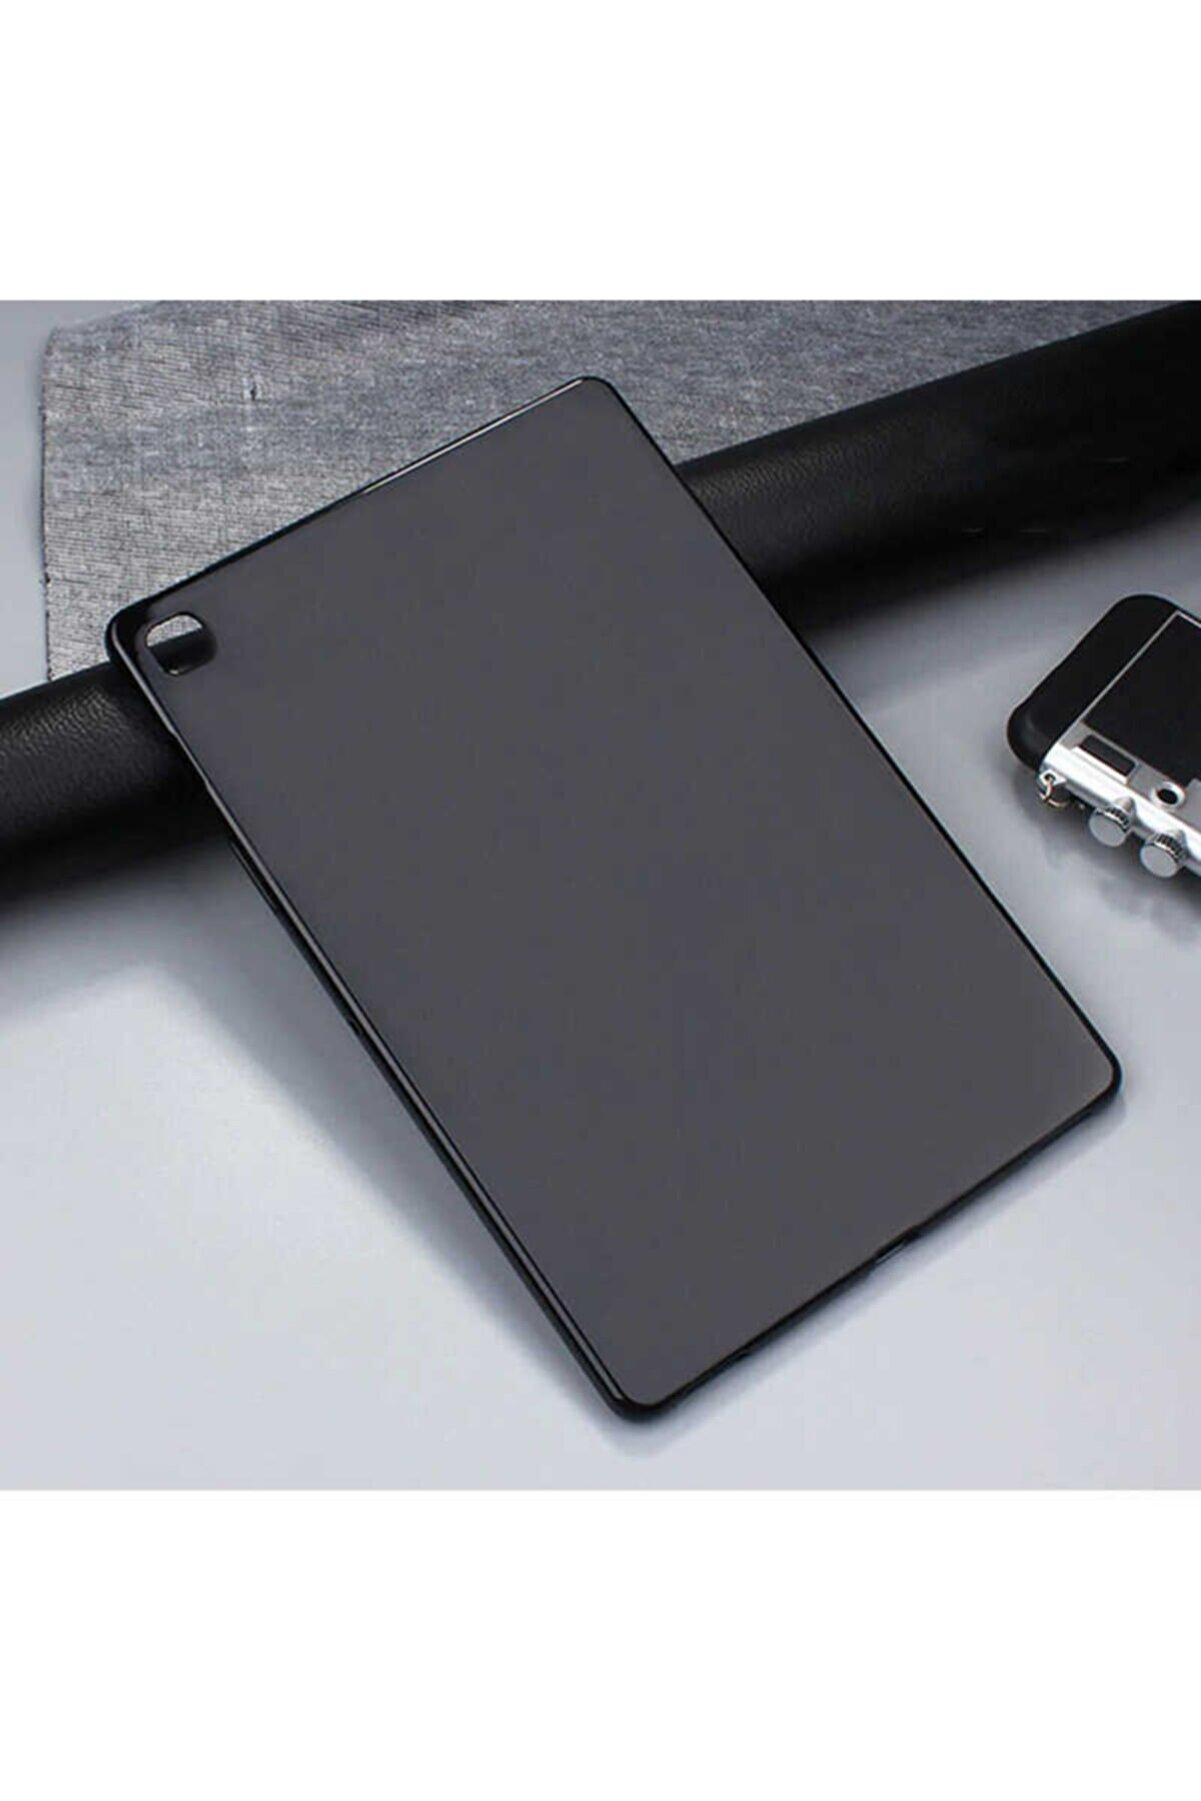 Telefon Aksesuarları Galaxy Tab S6 Lite P610 Silikon Kılıf